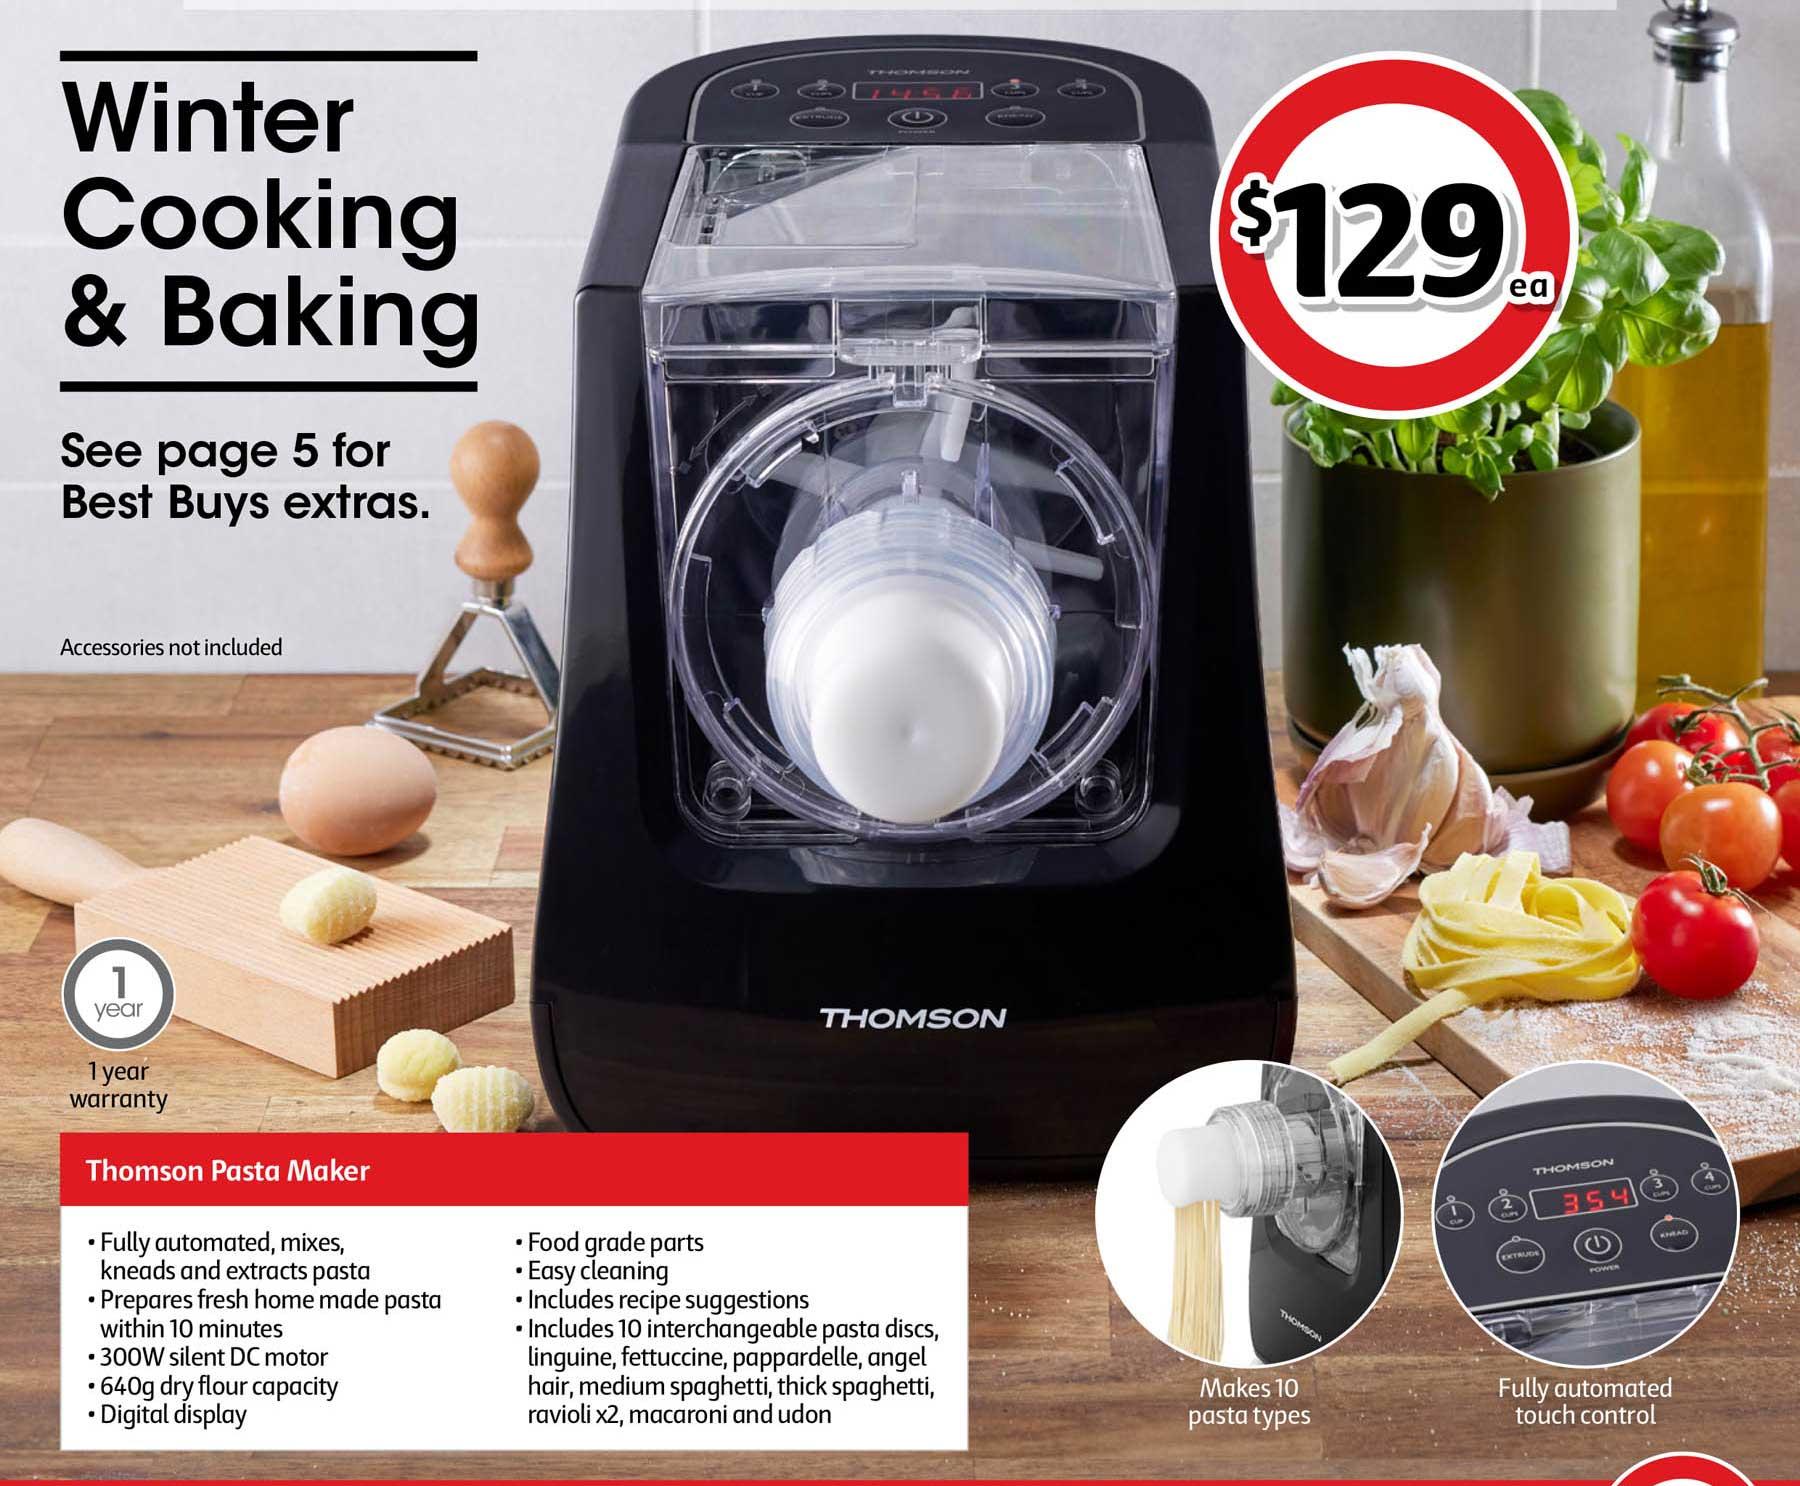 Coles Thomson Pasta Maker